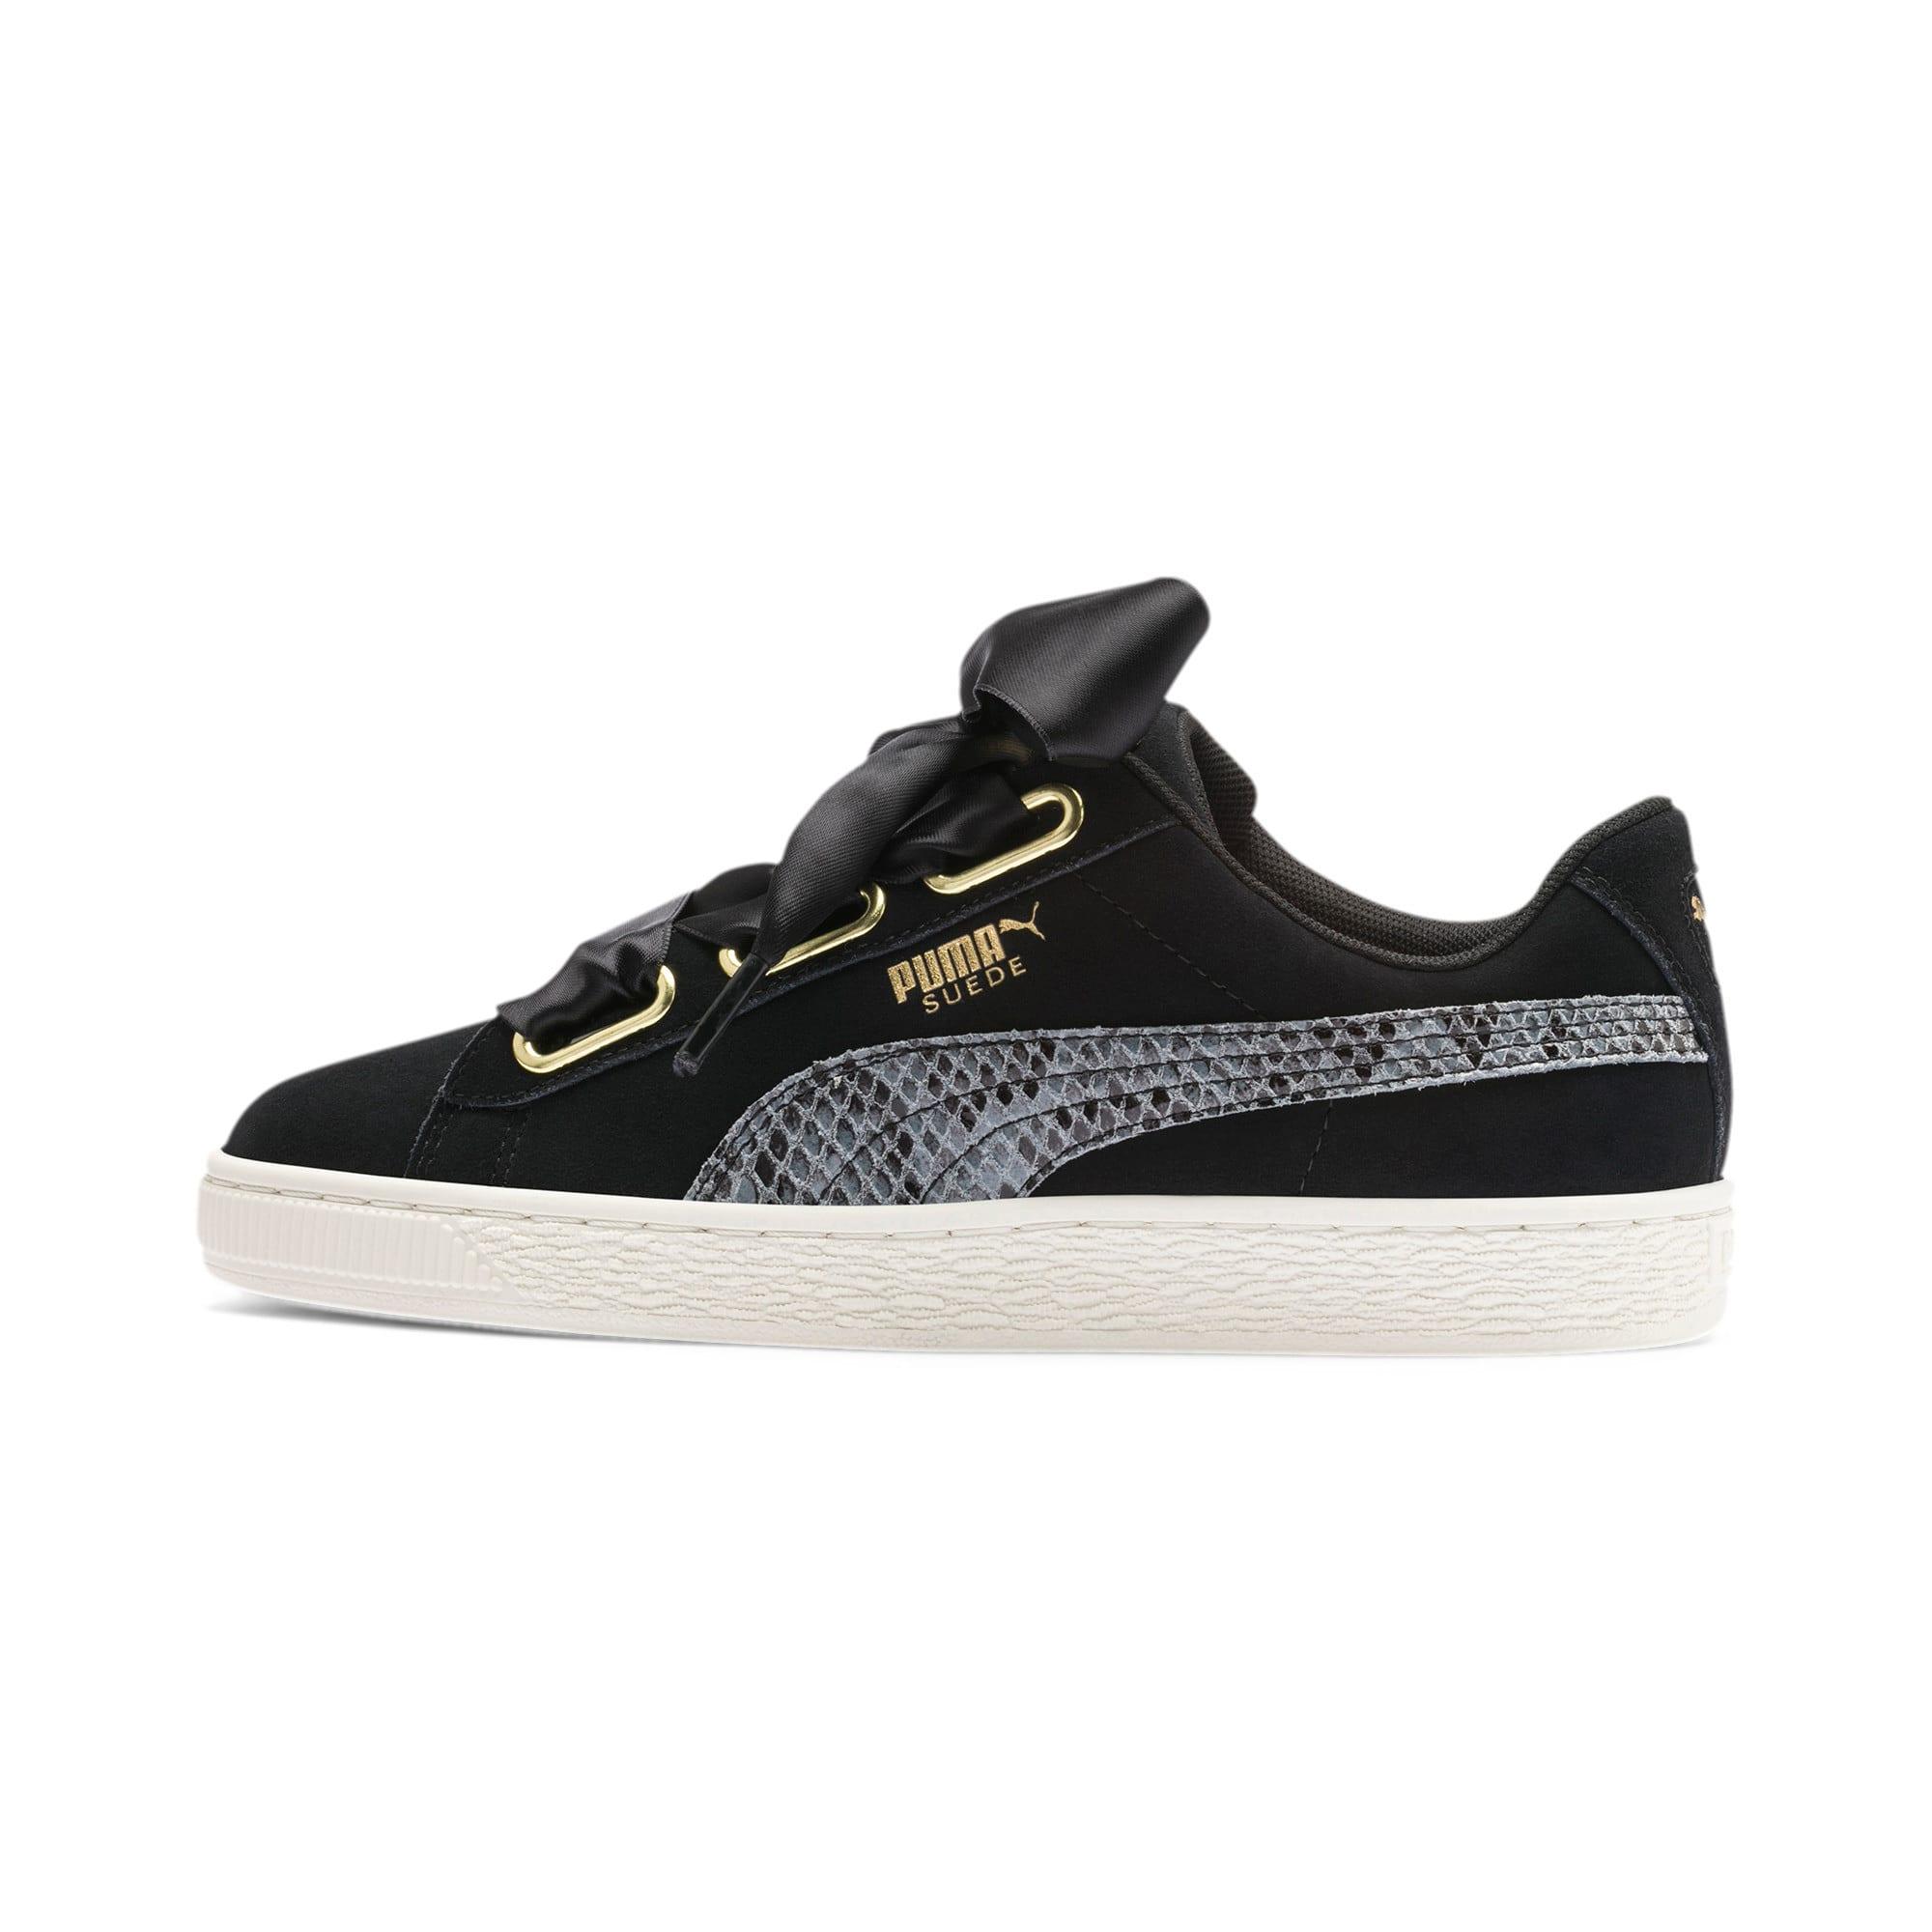 Thumbnail 1 of Suede Heart Snake Lux Women's Sneakers, Puma Black-Puma Team Gold, medium